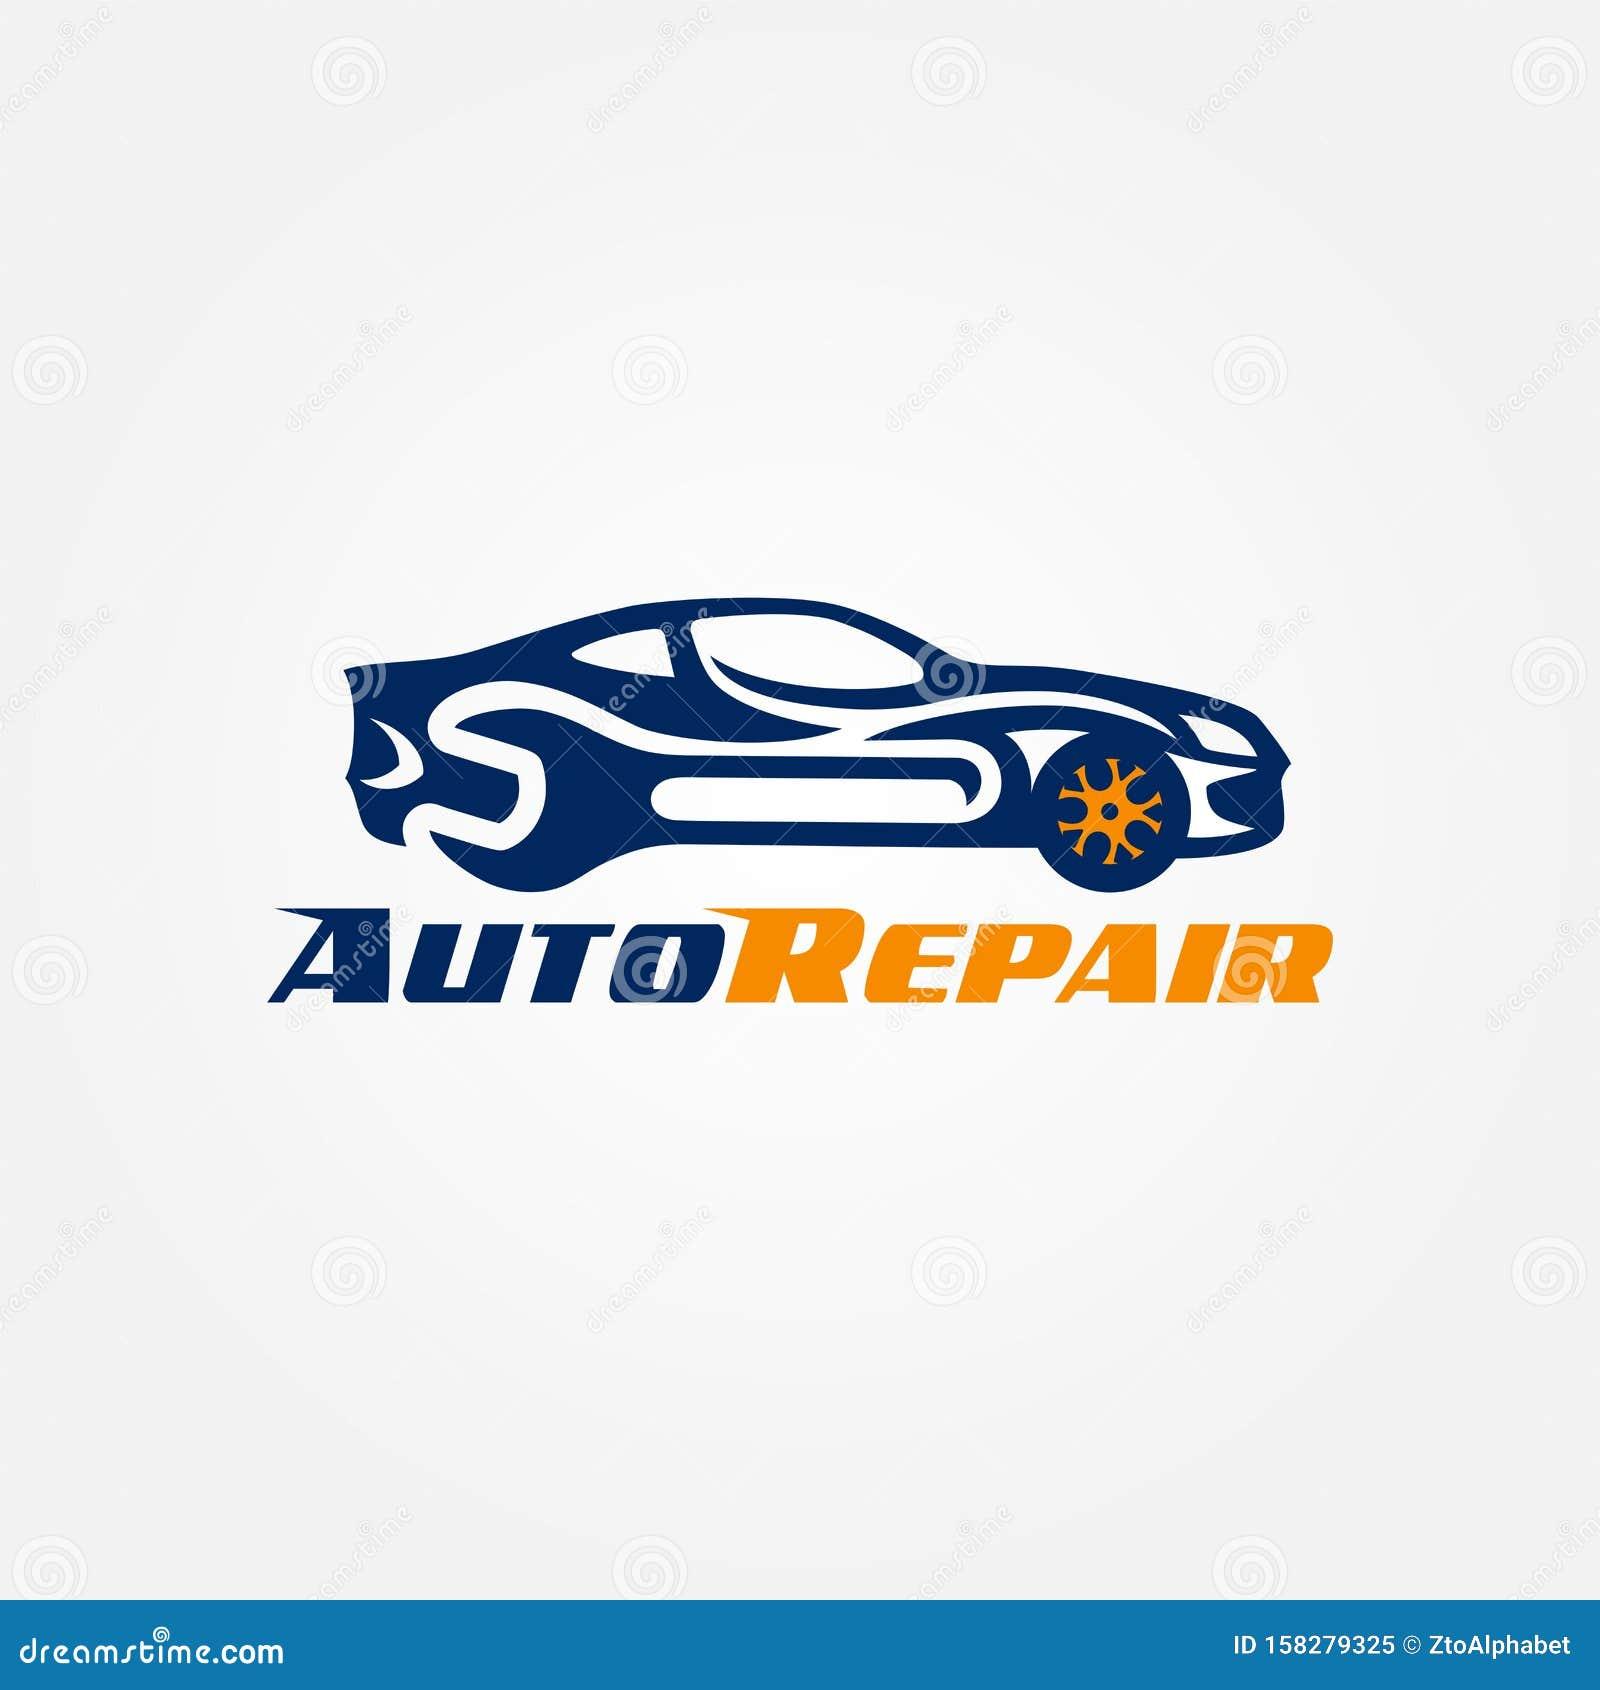 Car Repair Shop Logo Stock Vector Illustration Of Performance 158279325